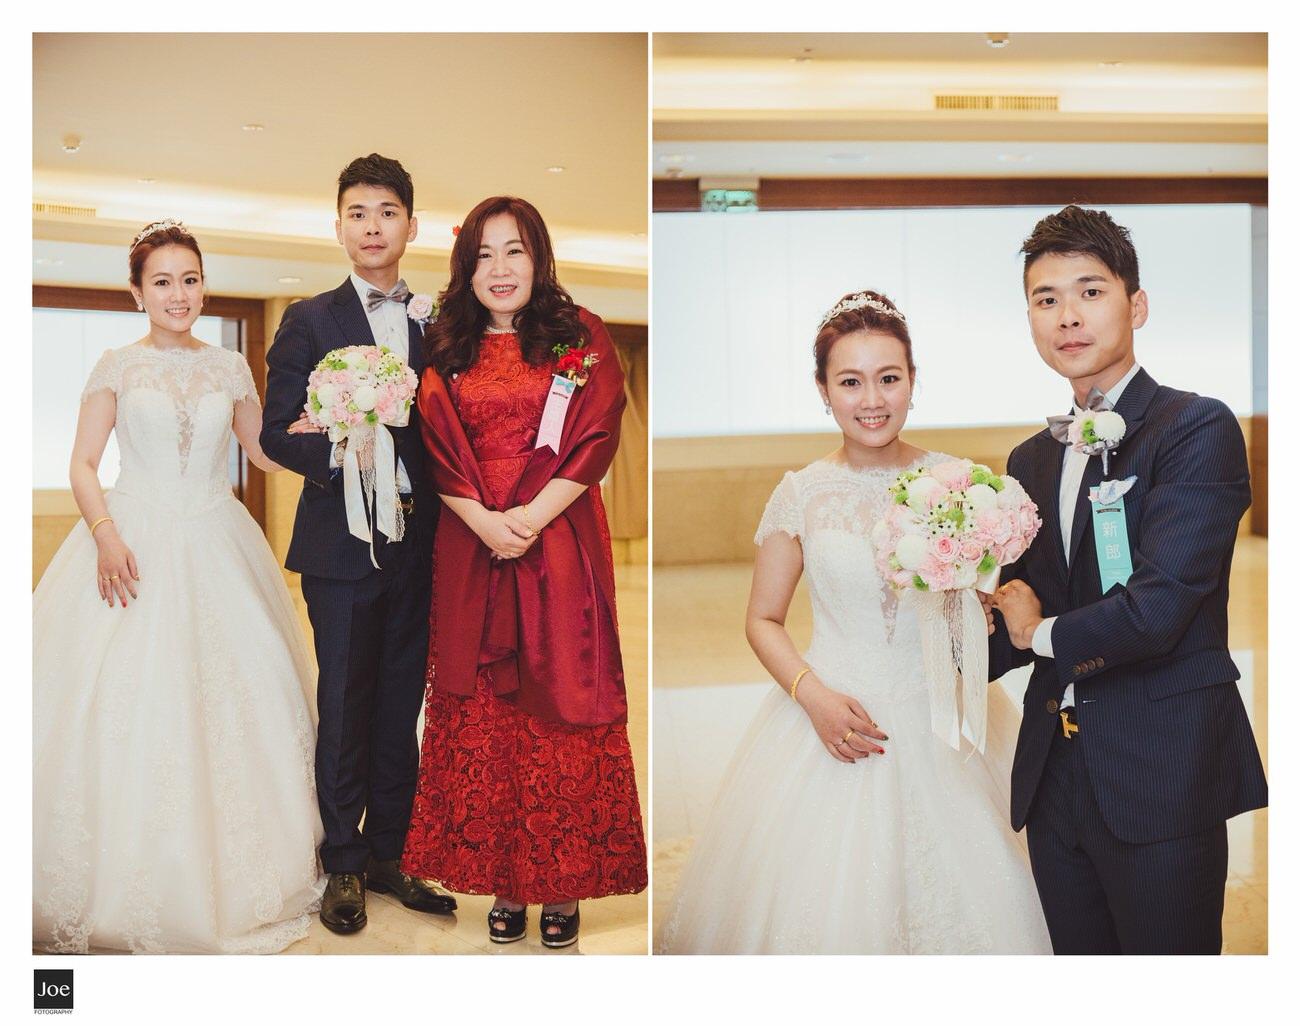 sunworld-dynasty-hotel-taipei-wedding-photo-joe-fotography-angel-jay-075.jpg